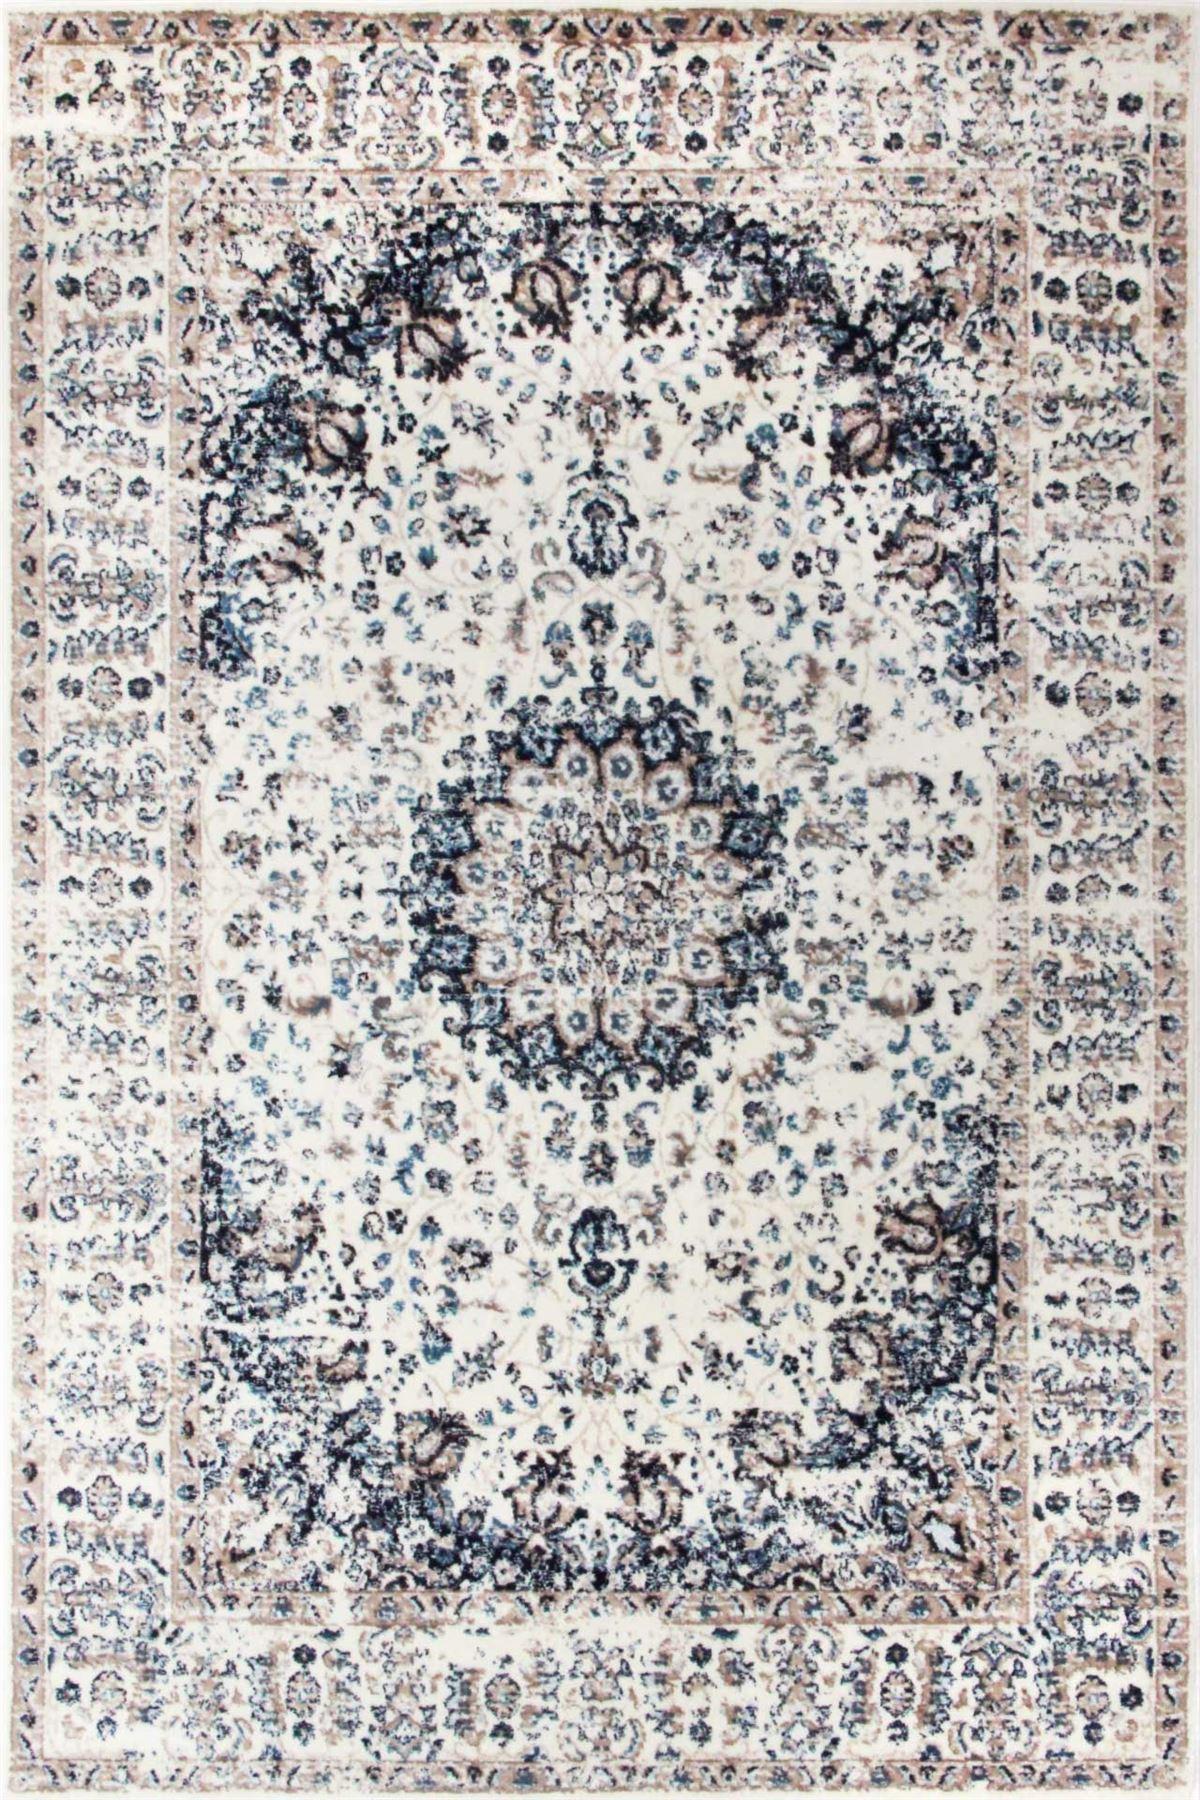 Area-di-Pavimento-Soggiorno-Tappeti-Navy-Avorio-Vintage-Oriental-Floral-Medallion-Rugs miniatura 9